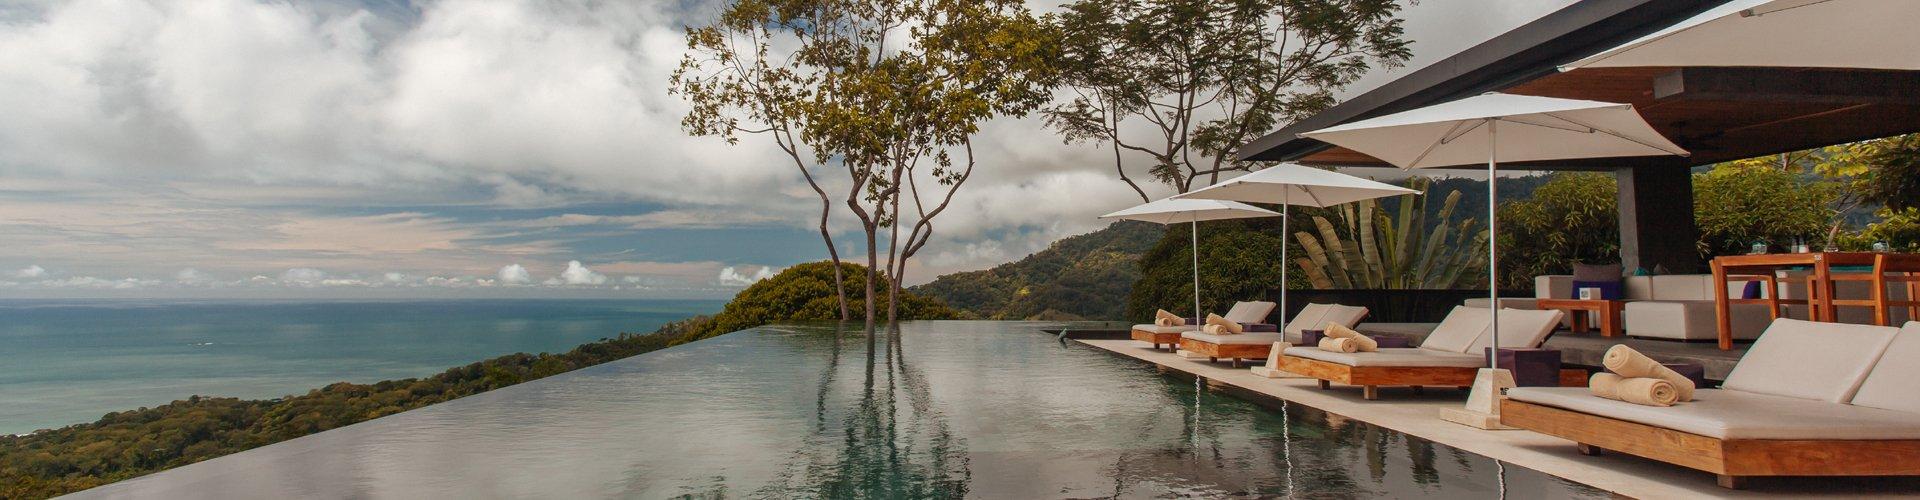 Costa Rica, Kura, Pool, Latin America Tours